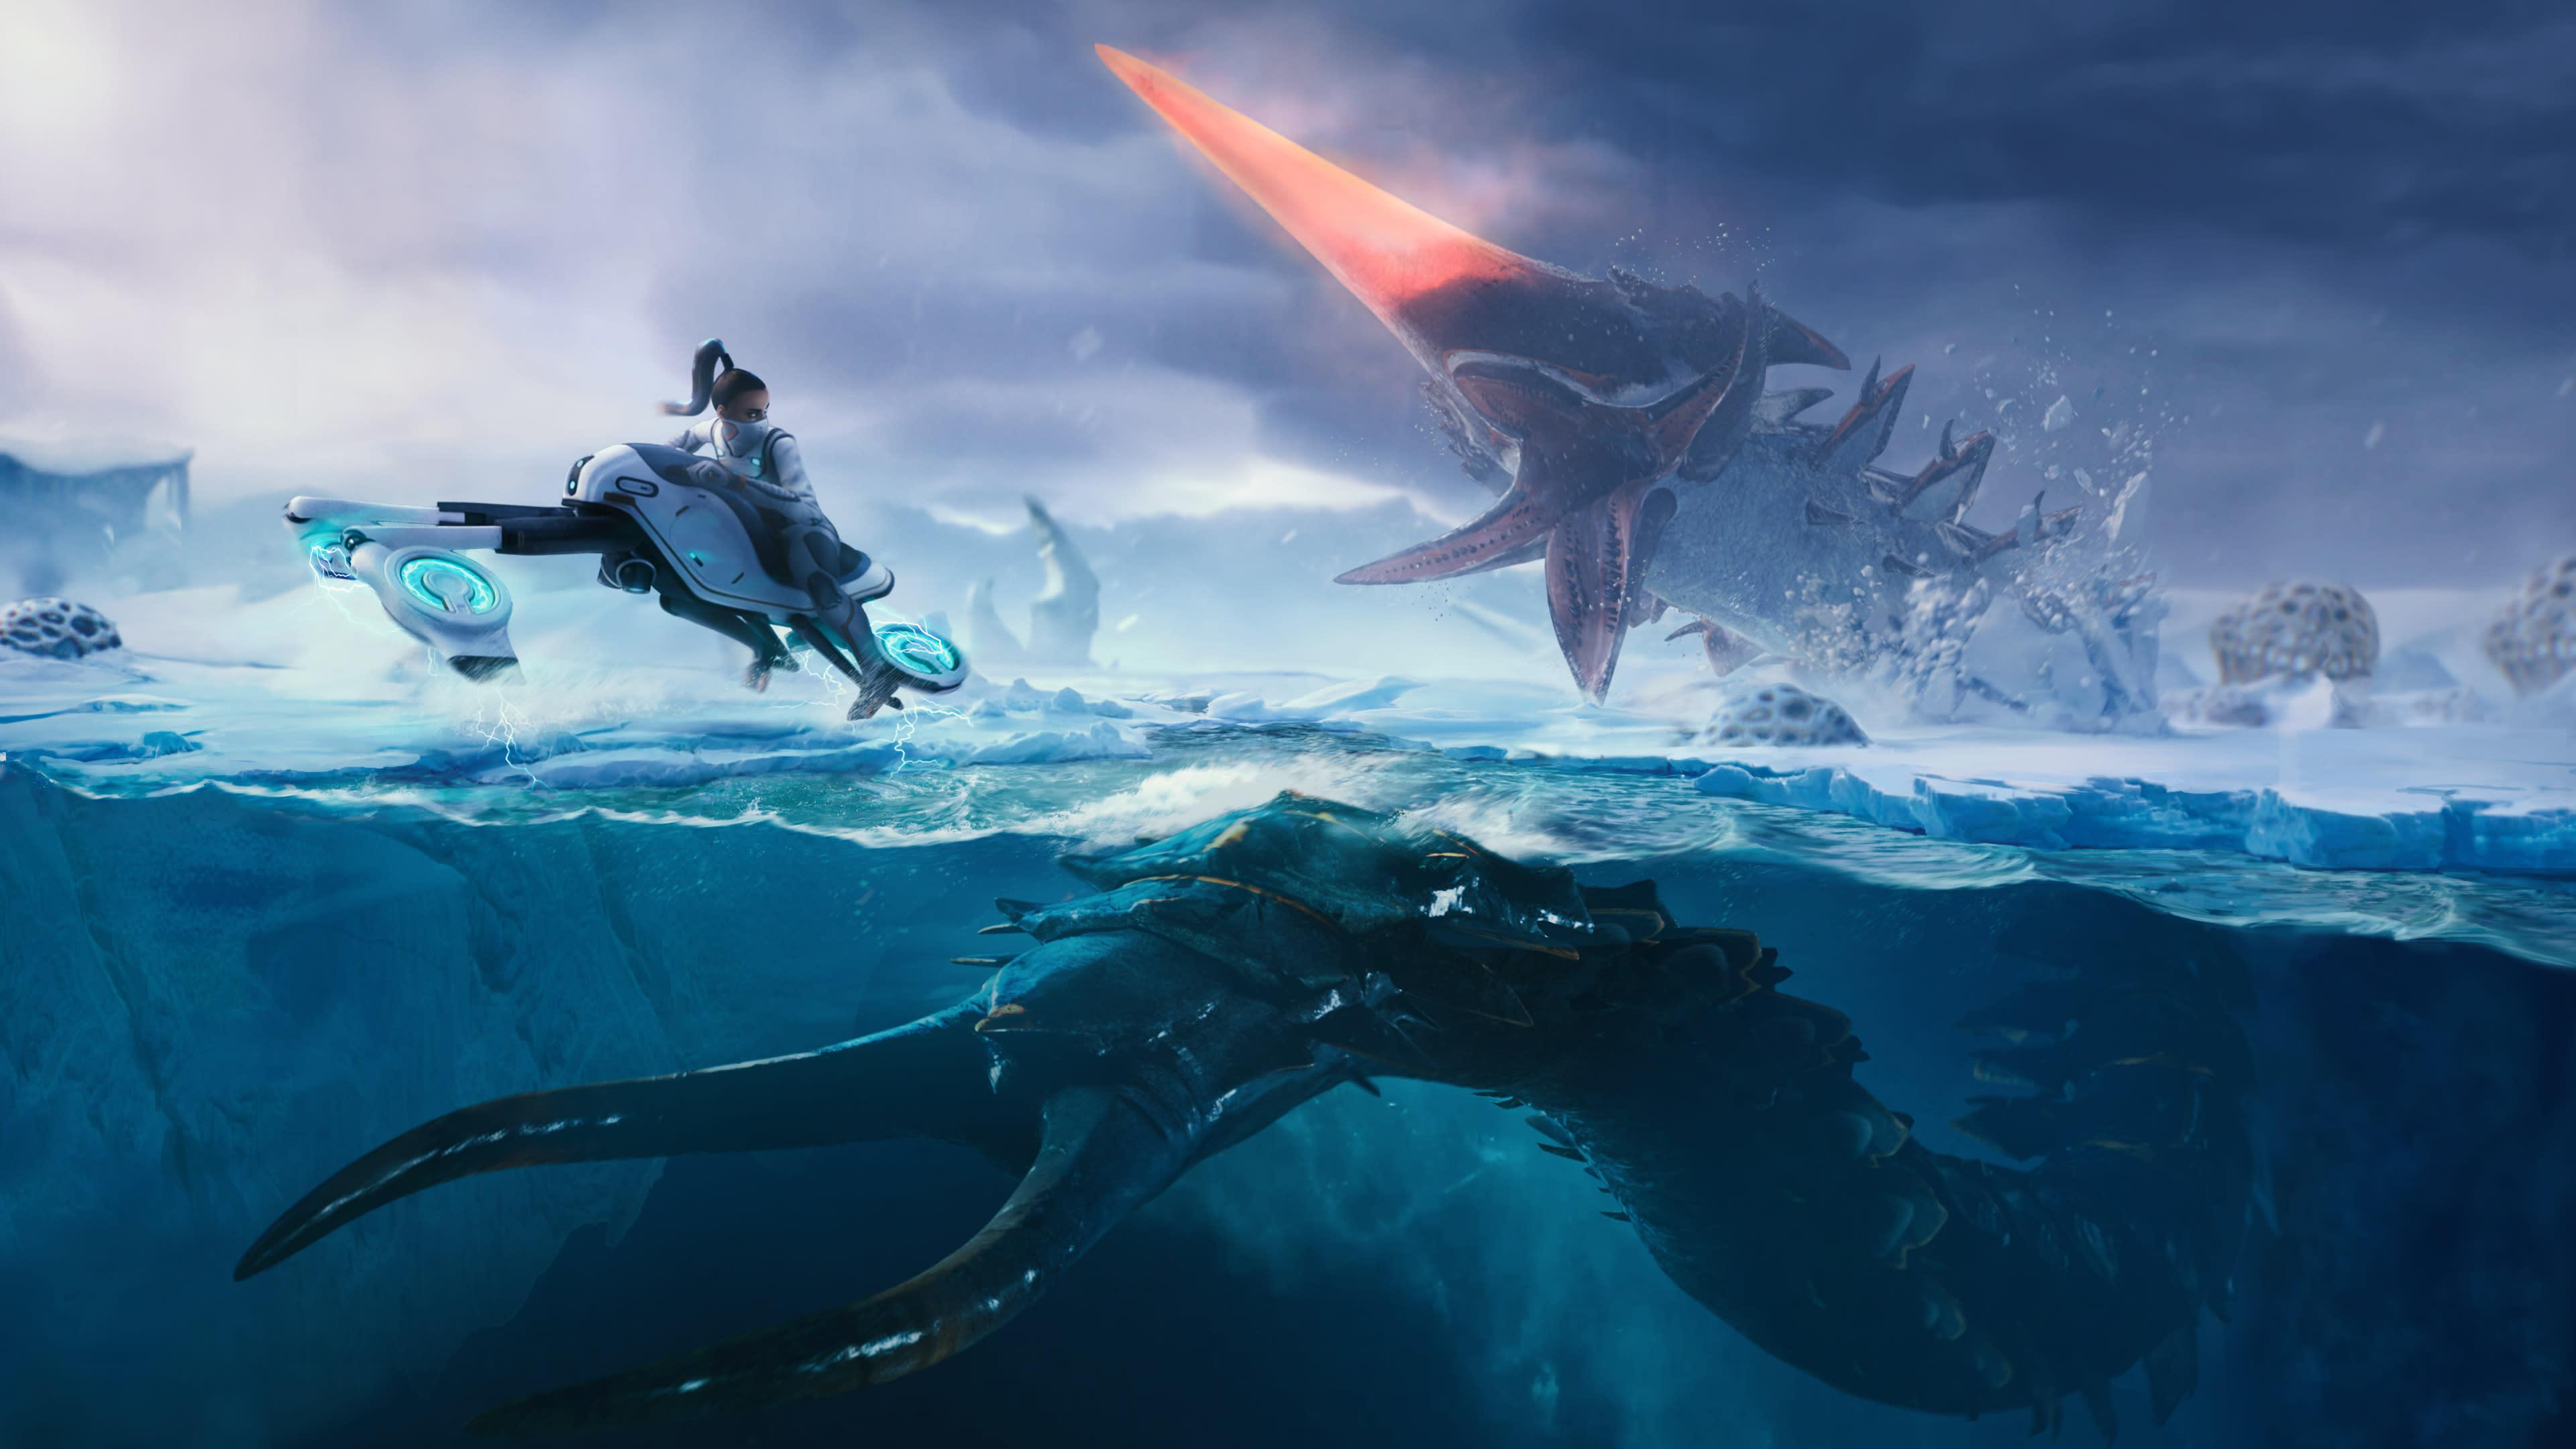 'Subnautica: Below Zero' will get a full release in May | Engadget